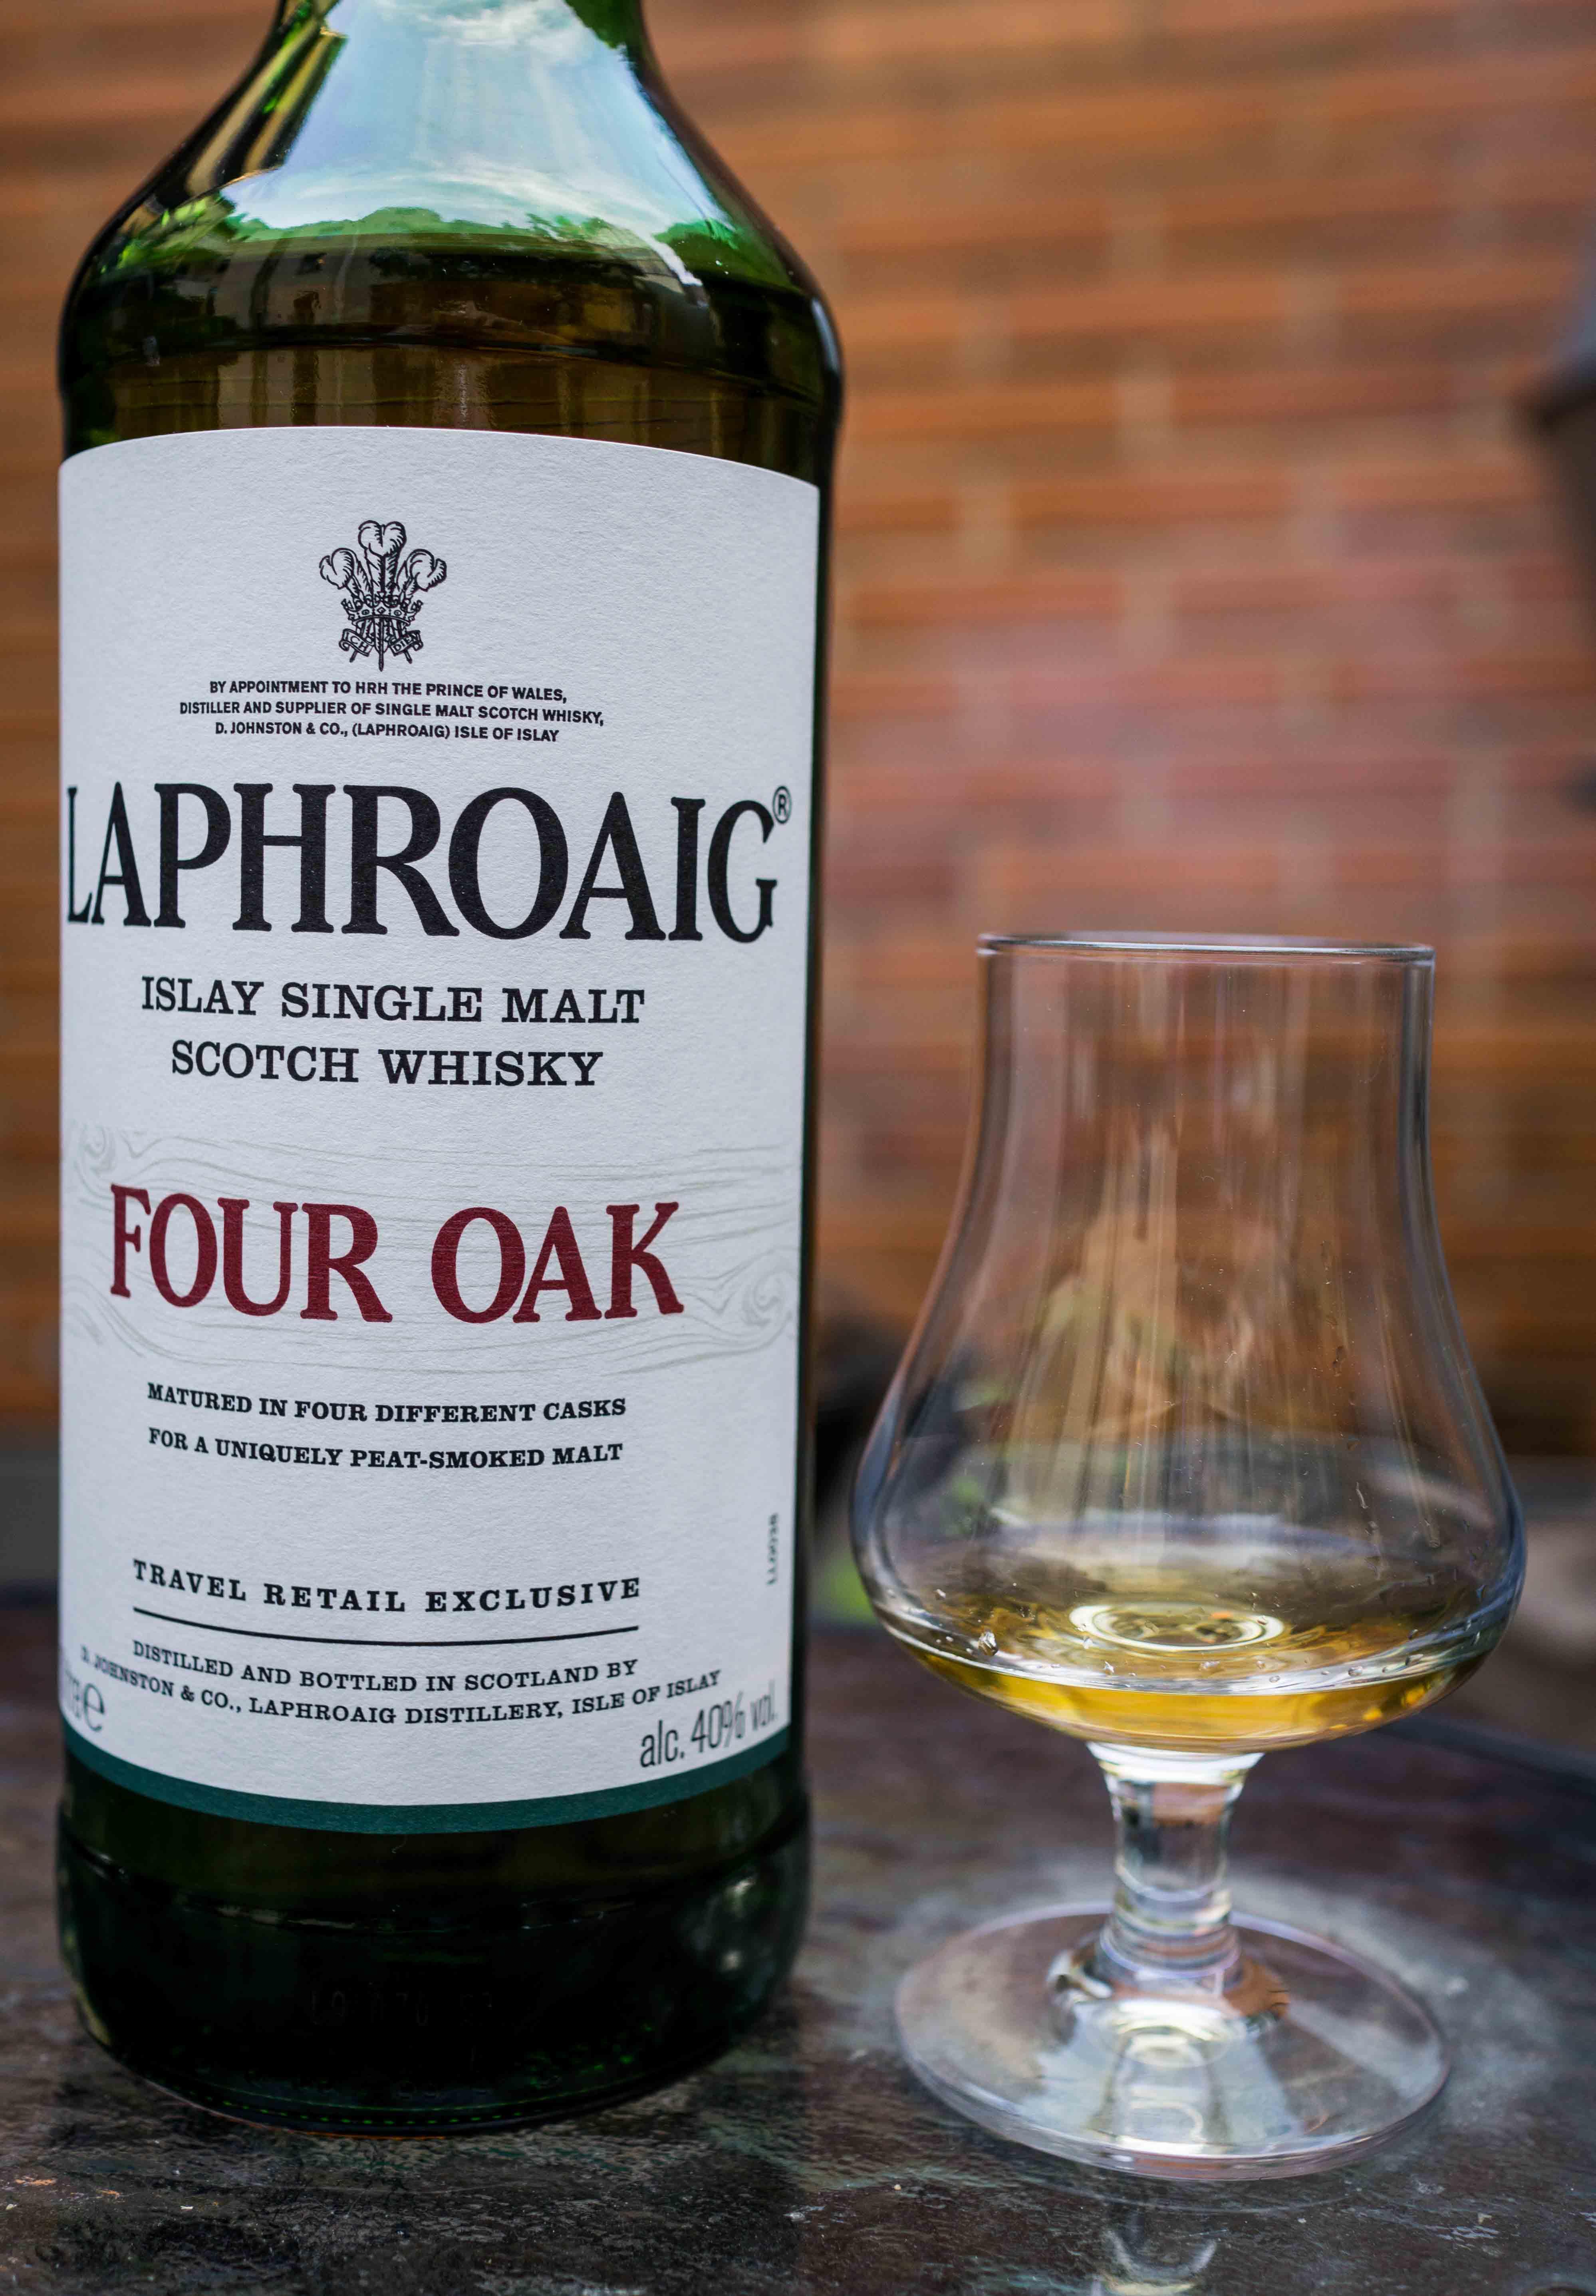 Laphroaig four oak